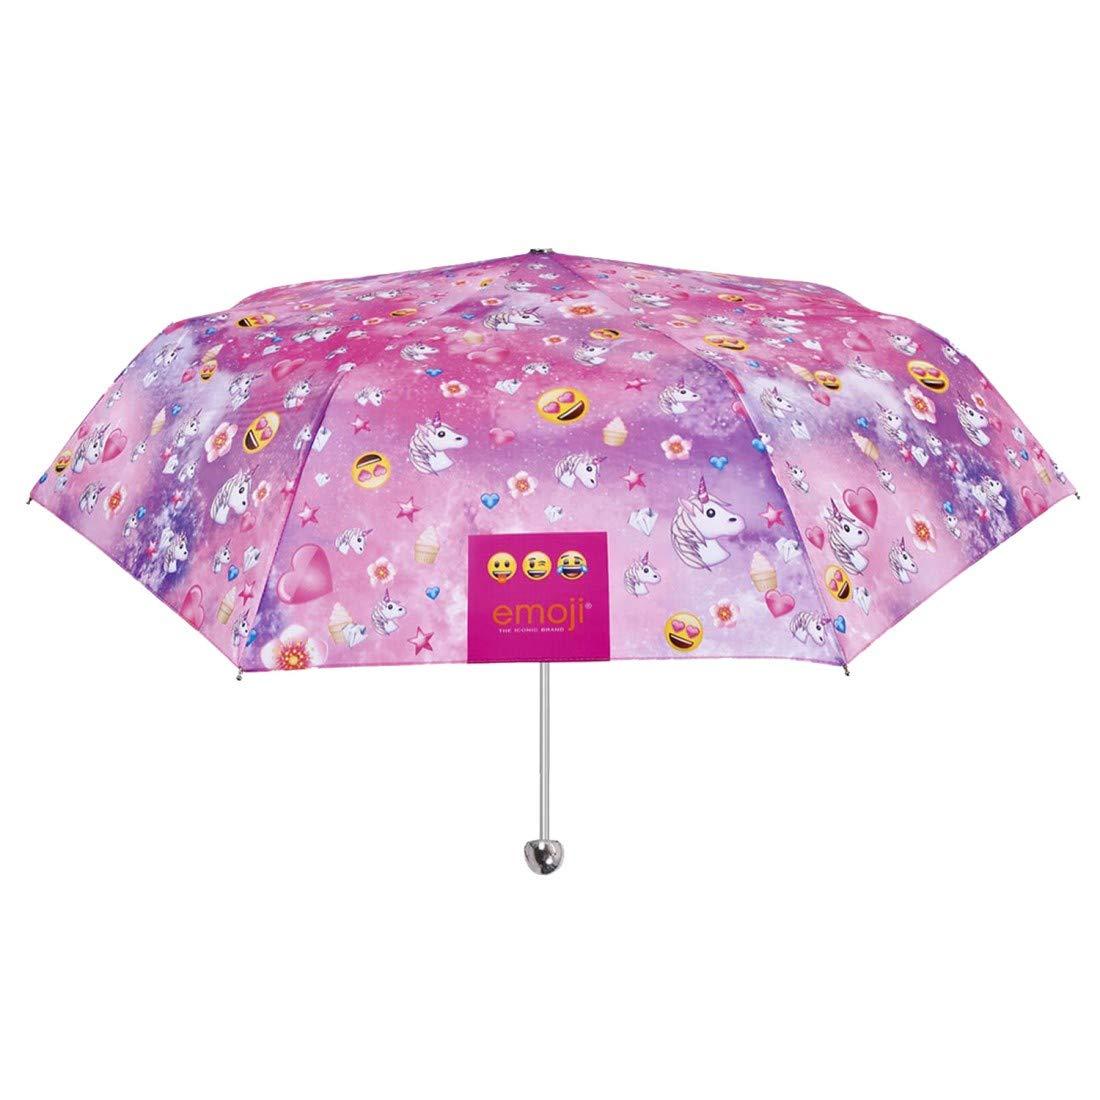 Emoji Parapluie manuel mini fille PERLETTI coupe-vent O91